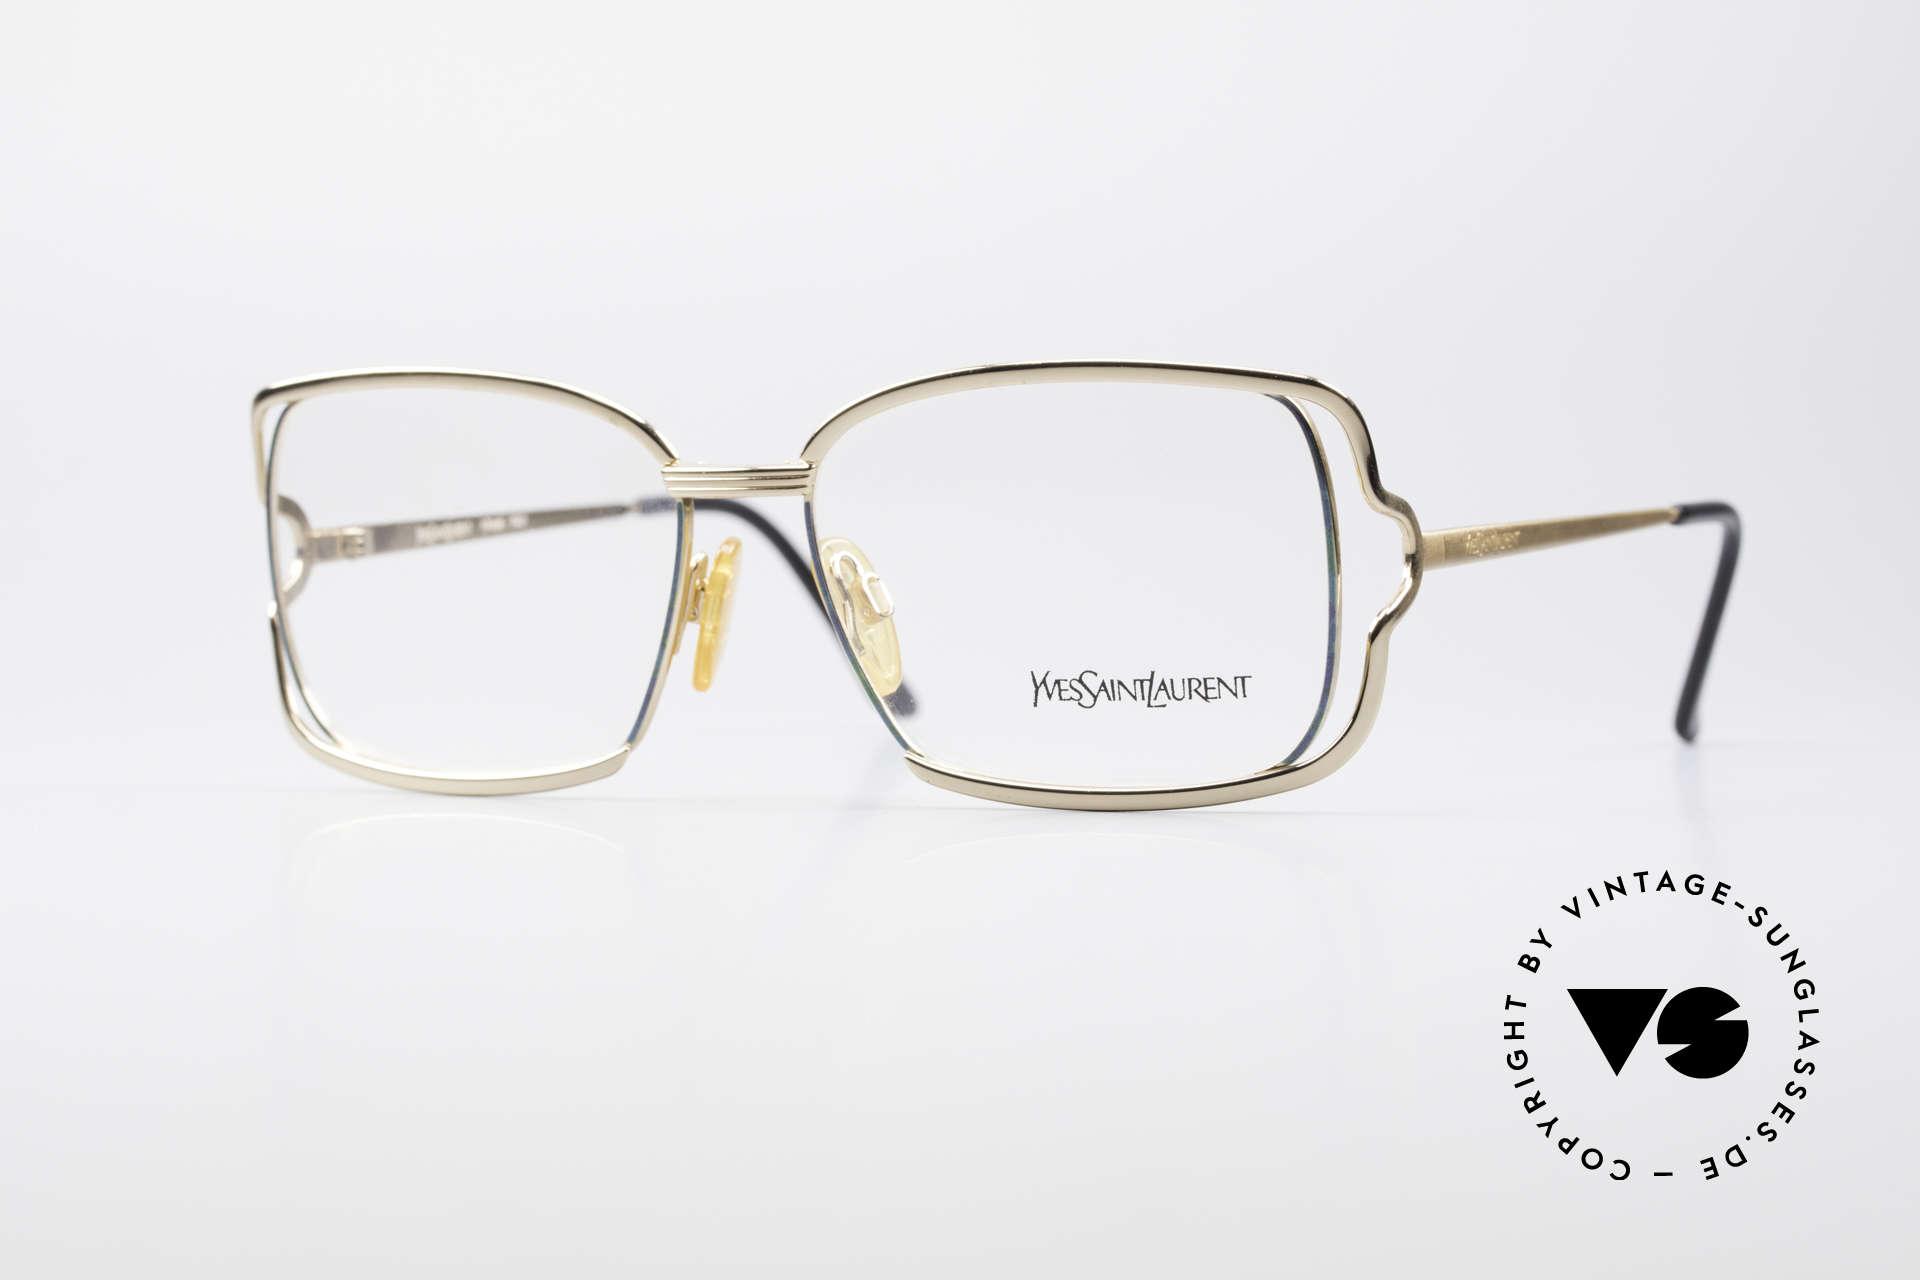 Yves Saint Laurent 4046 Vintage Ladies Eyeglasses, extravagant vintage eyeglass-frame for ladies, Made for Women